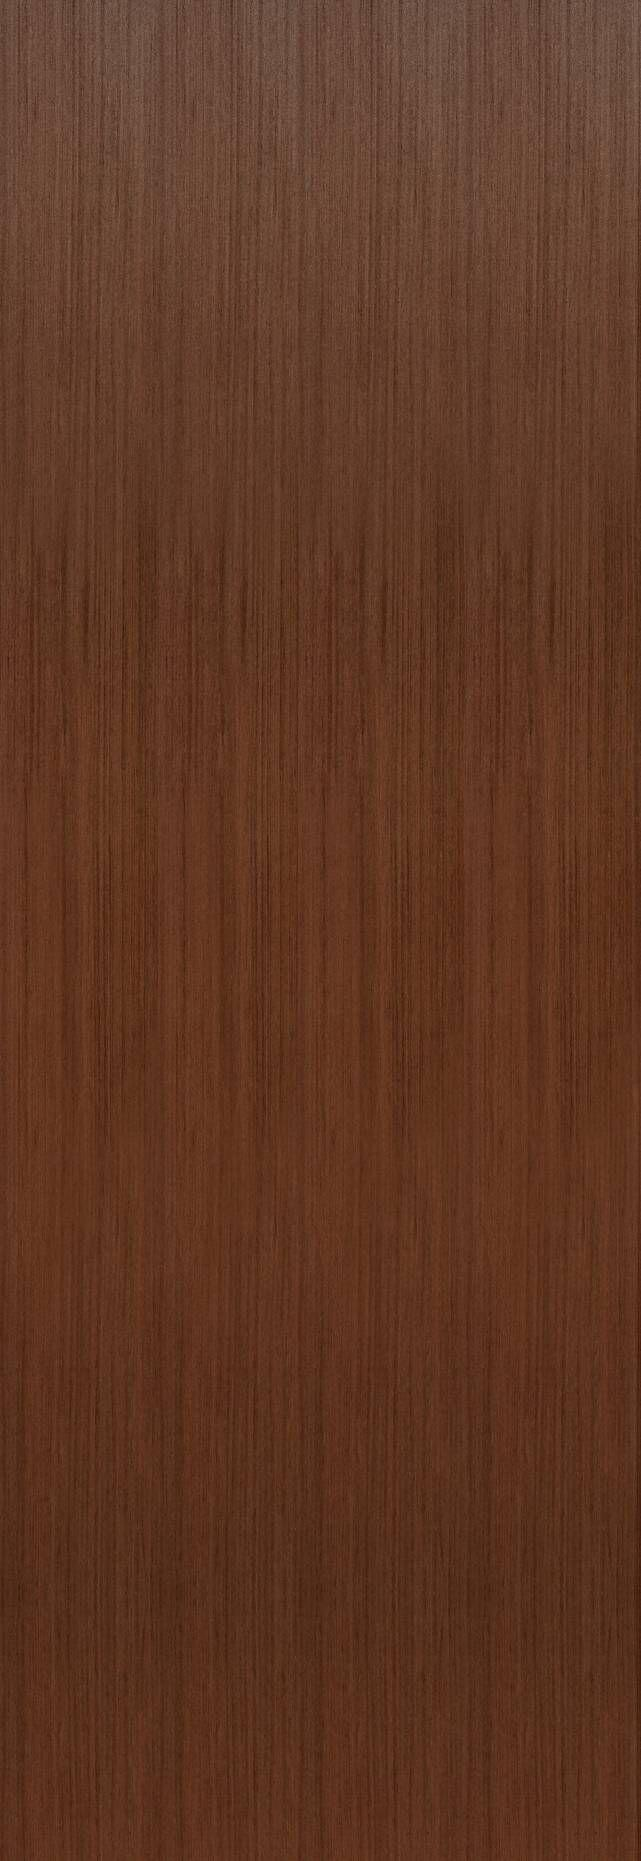 Tivoli А-1 Invisible цвет - Темный орех Без стекла (ДГ)